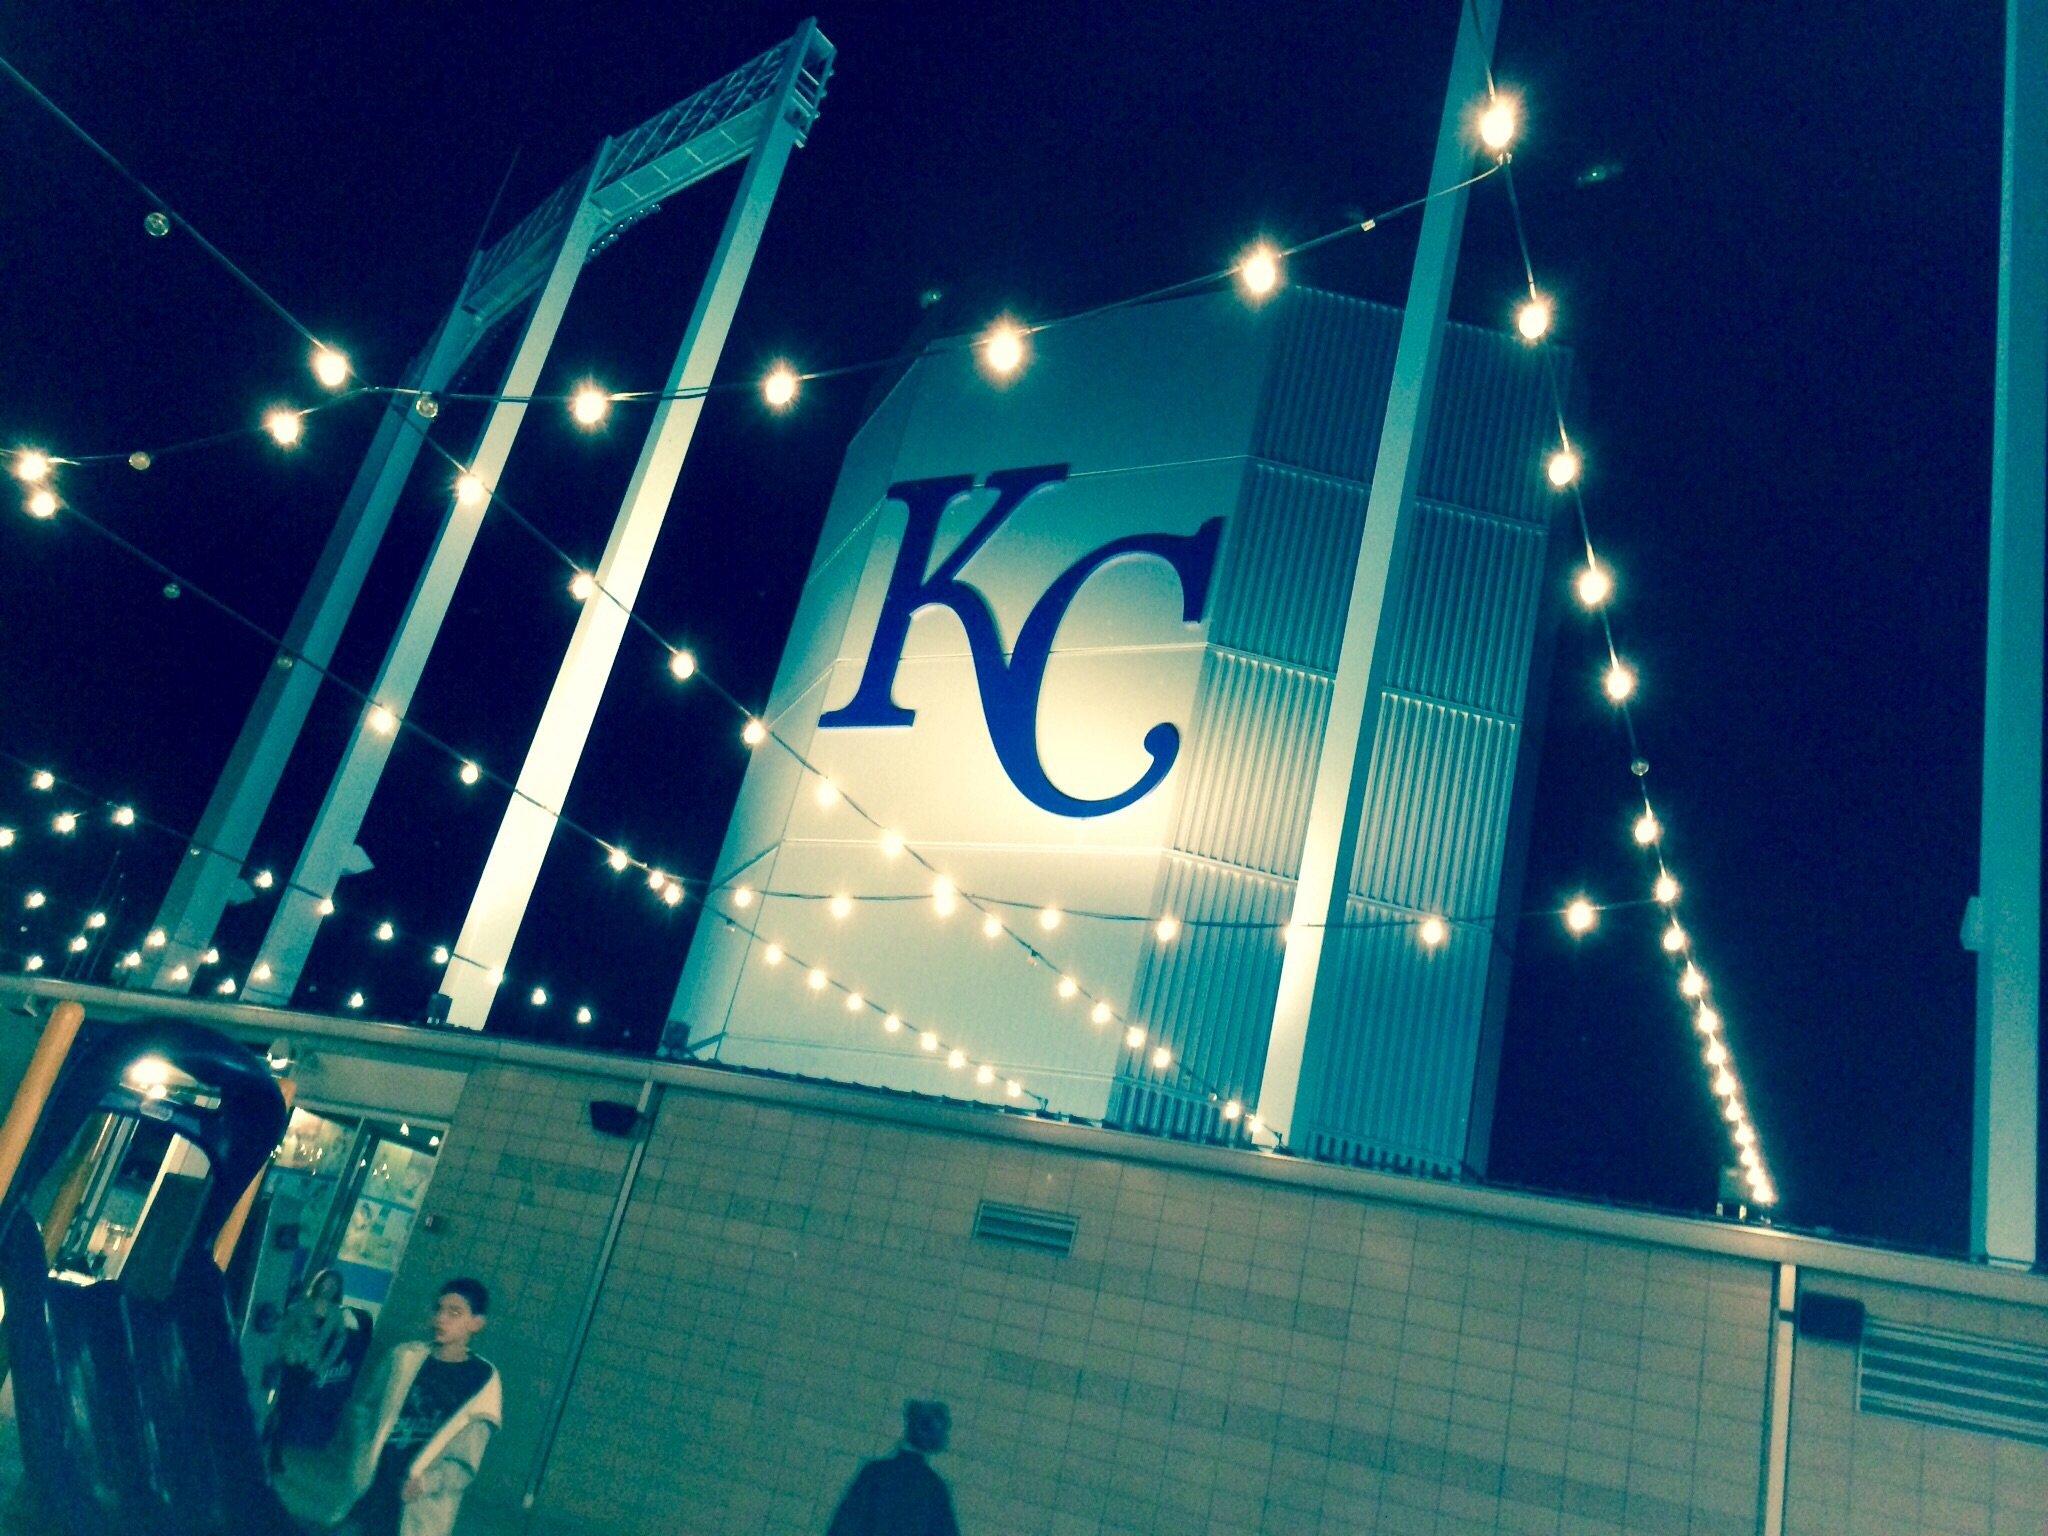 KC Royals wallpaper background 2048x1536